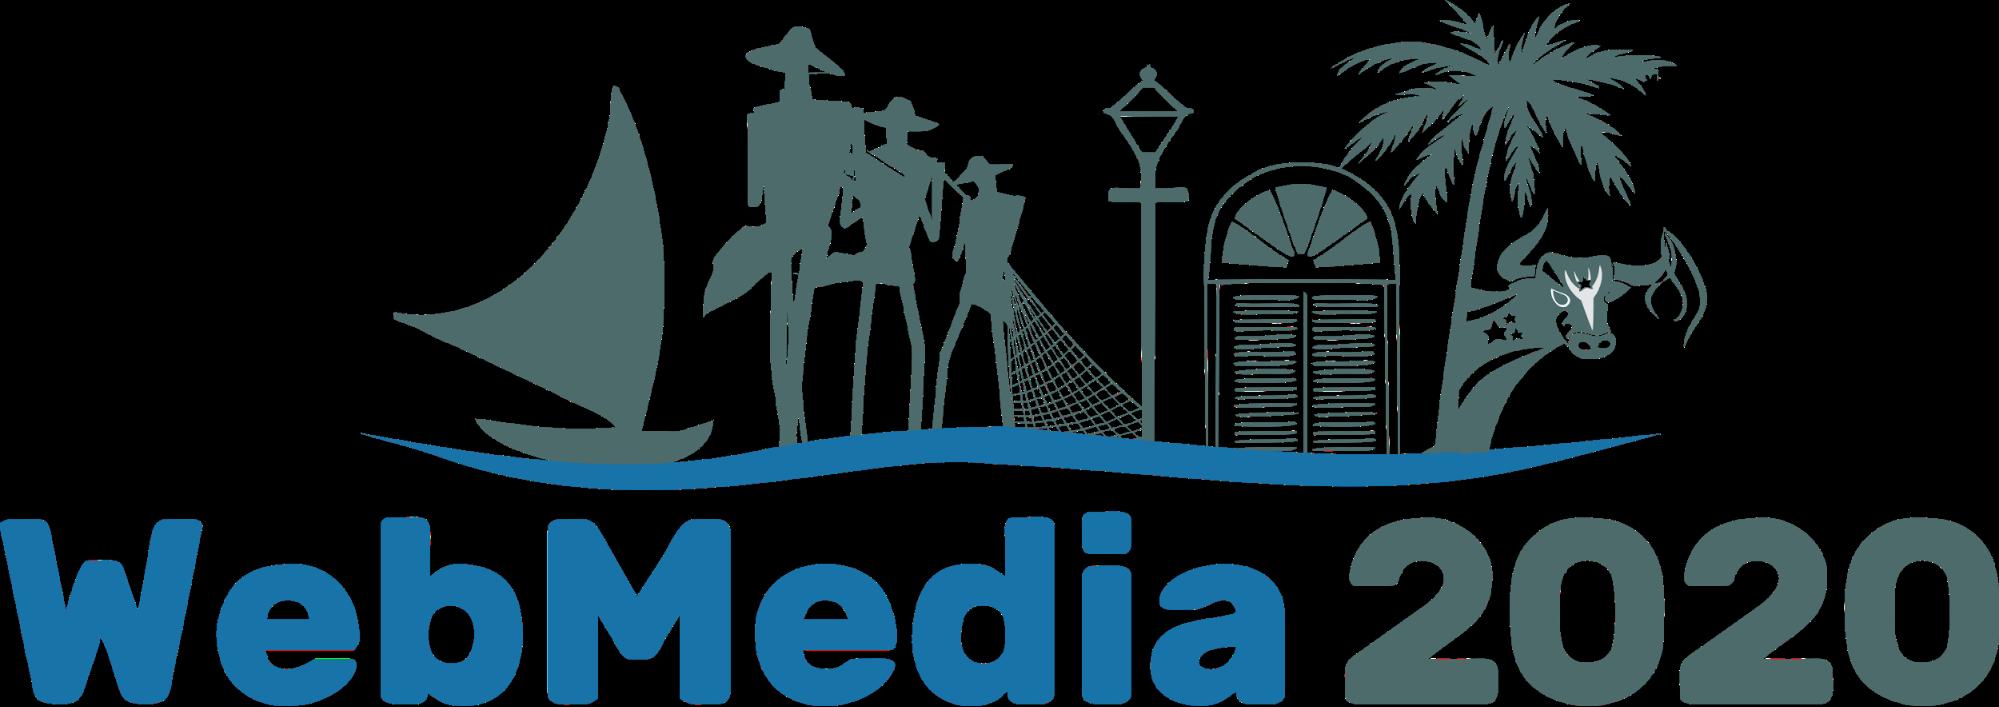 WebMedia2020